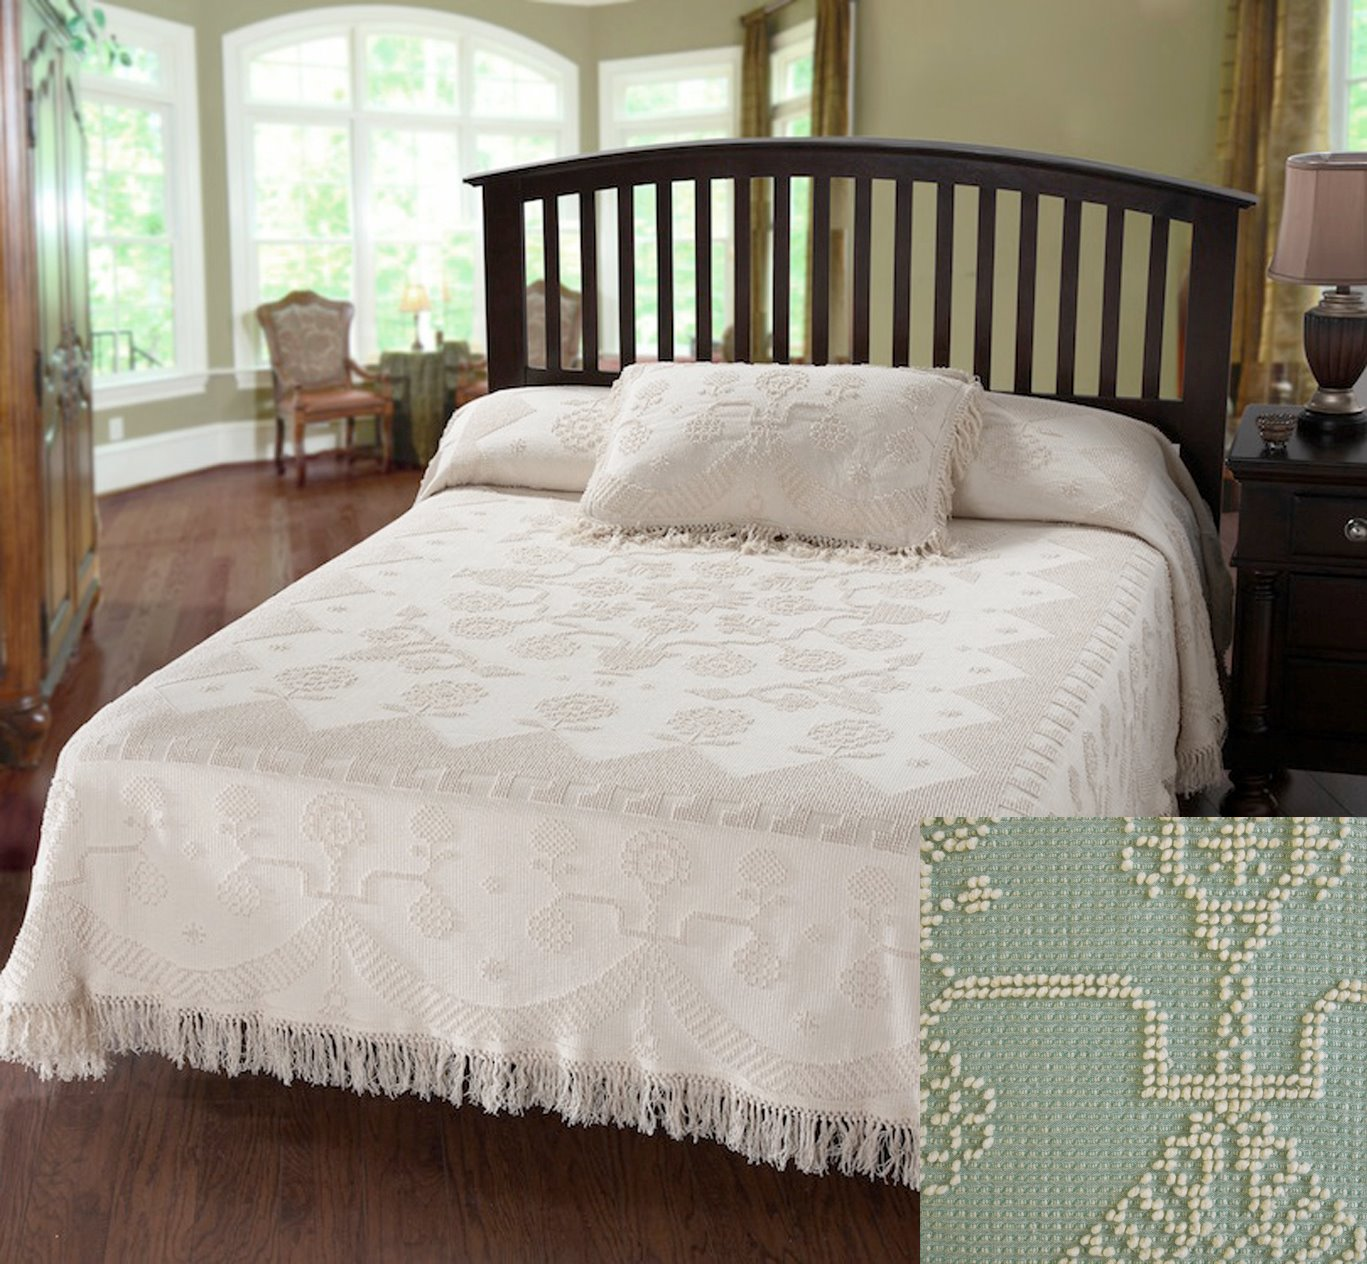 George Washington Bedspread Twin Sage